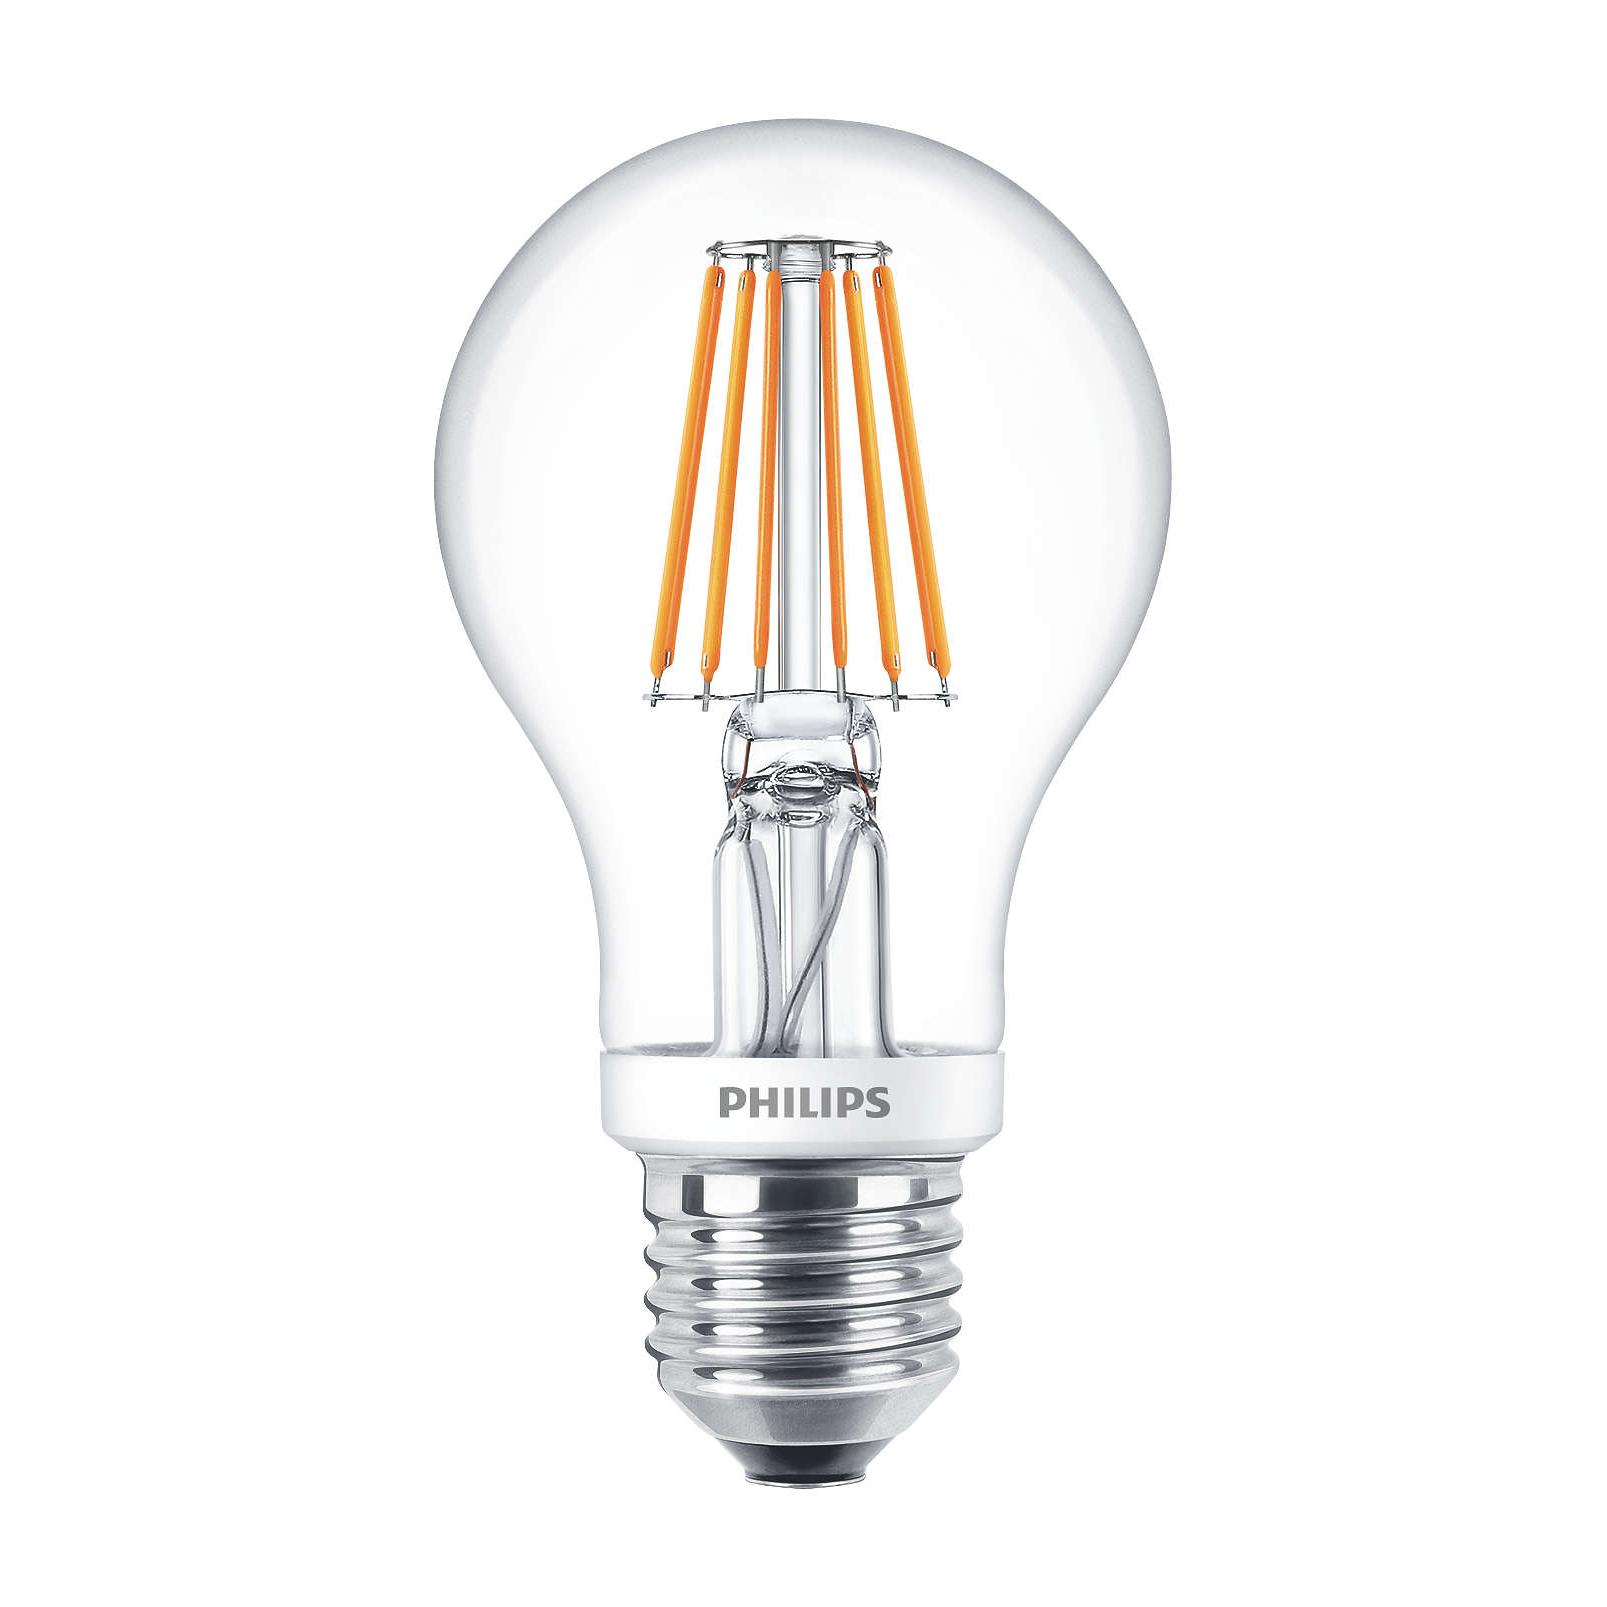 Philips LED Filament Bulb Clear A60 E27 7.5W 2700K